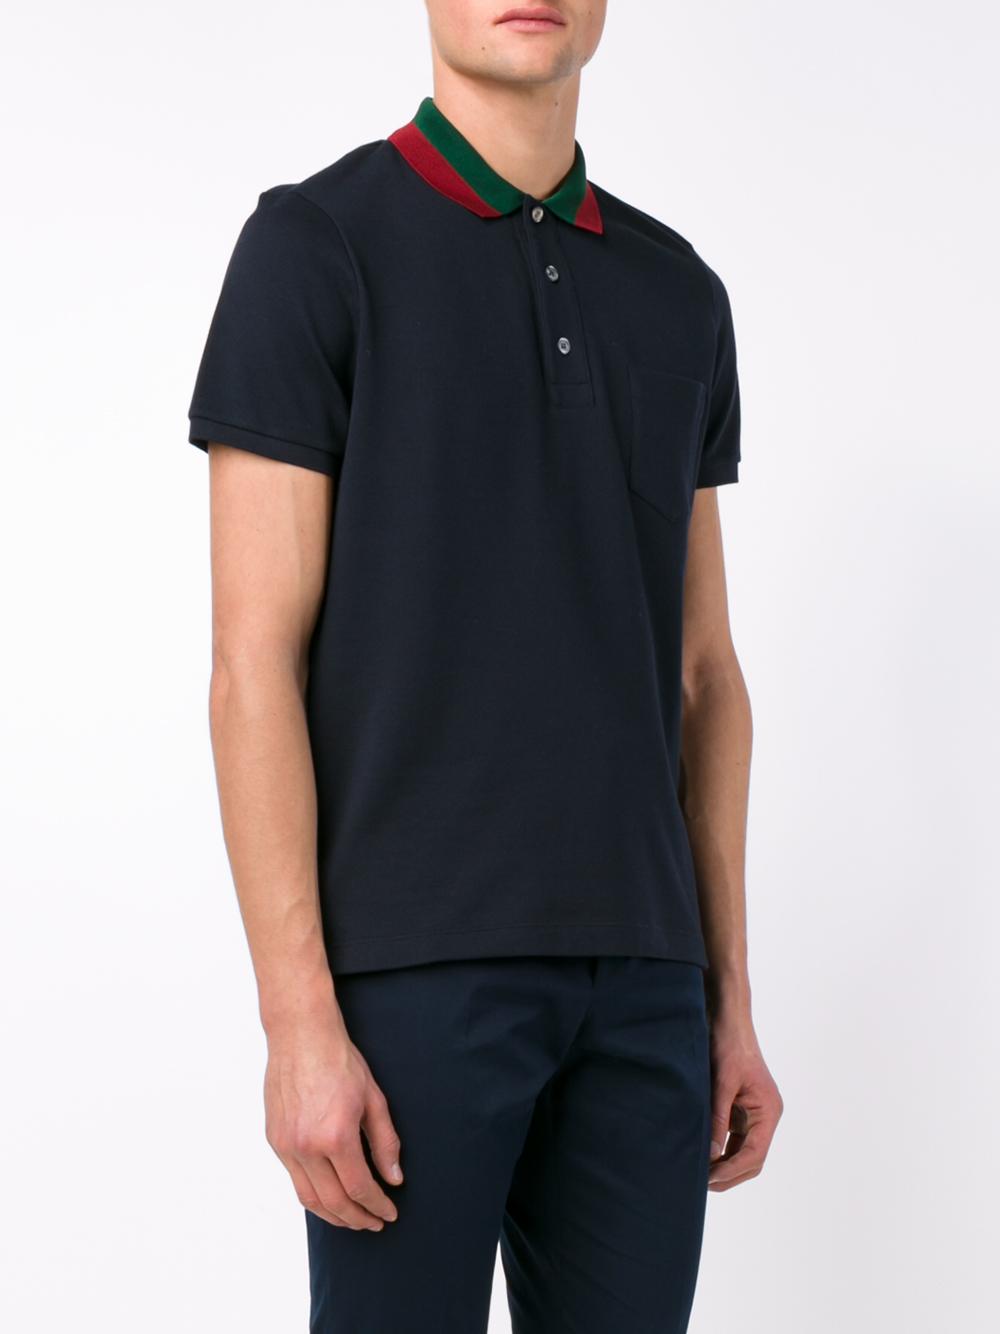 c72e97cca504 Lyst - Gucci Striped Collar Polo T-shirt in Blue for Men